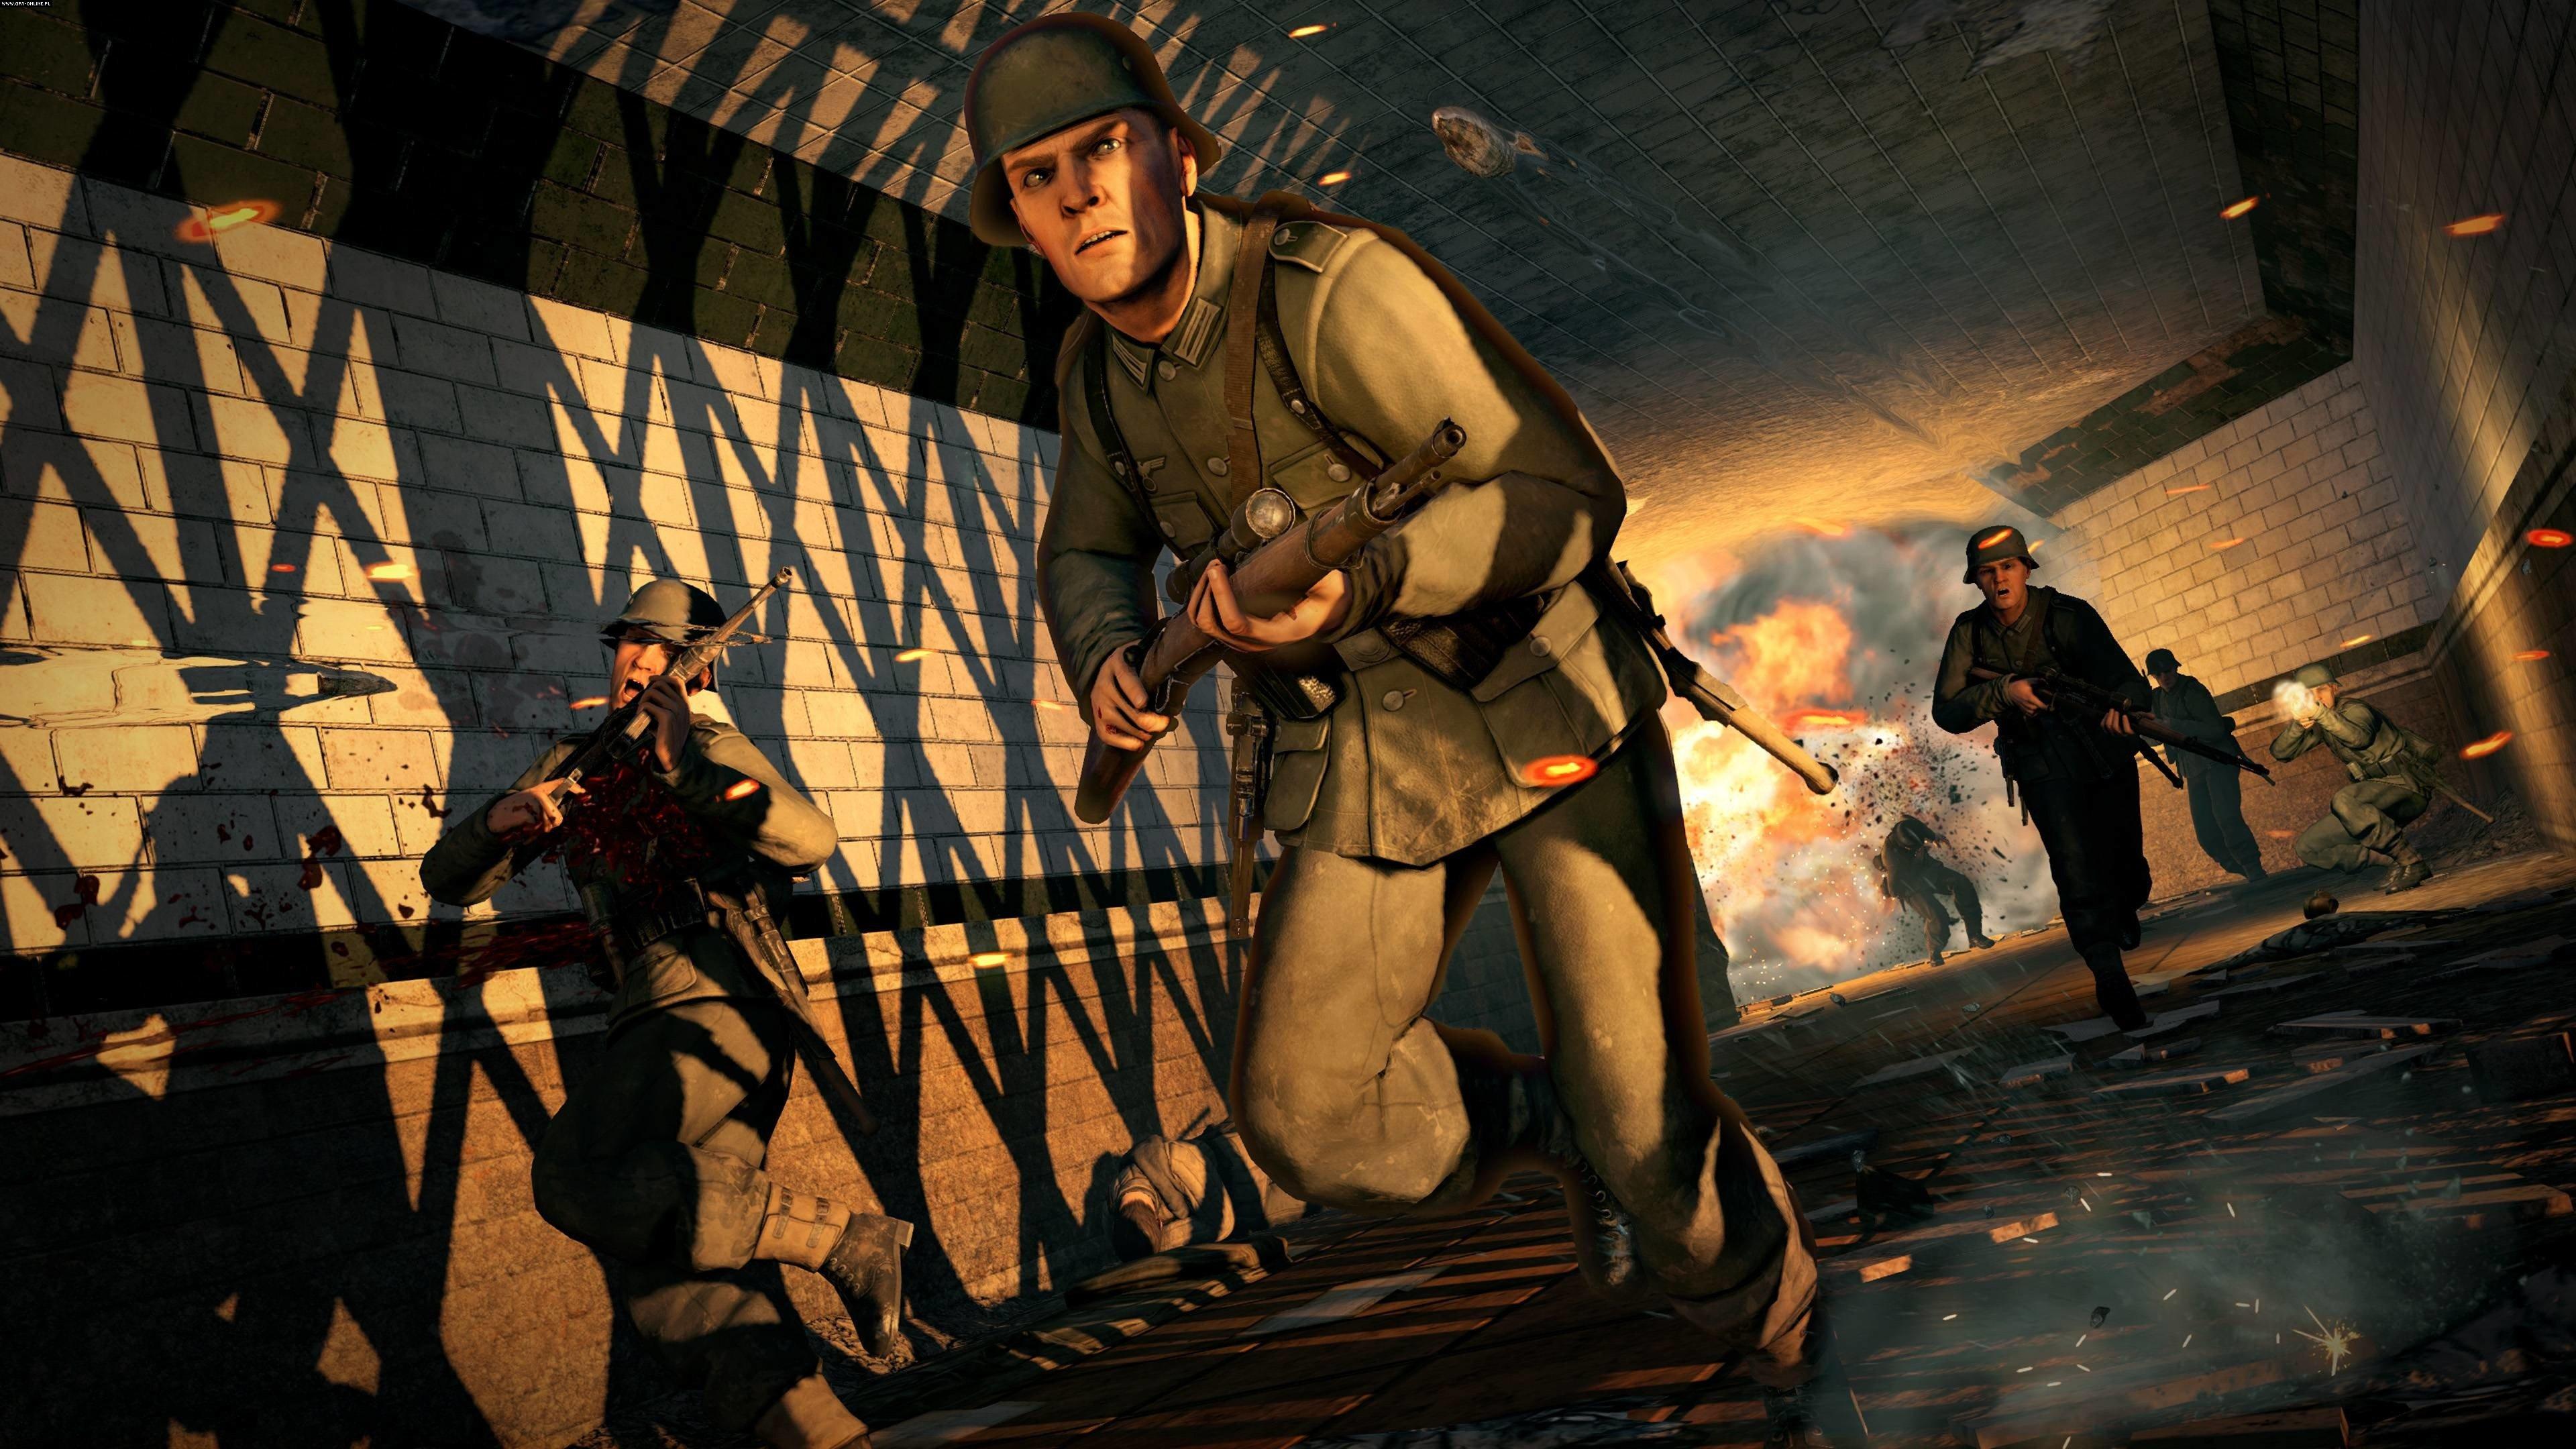 Sniper Elite V2 Remastered PC, PS4, XONE, Switch Games Image 6/8, Rebellion